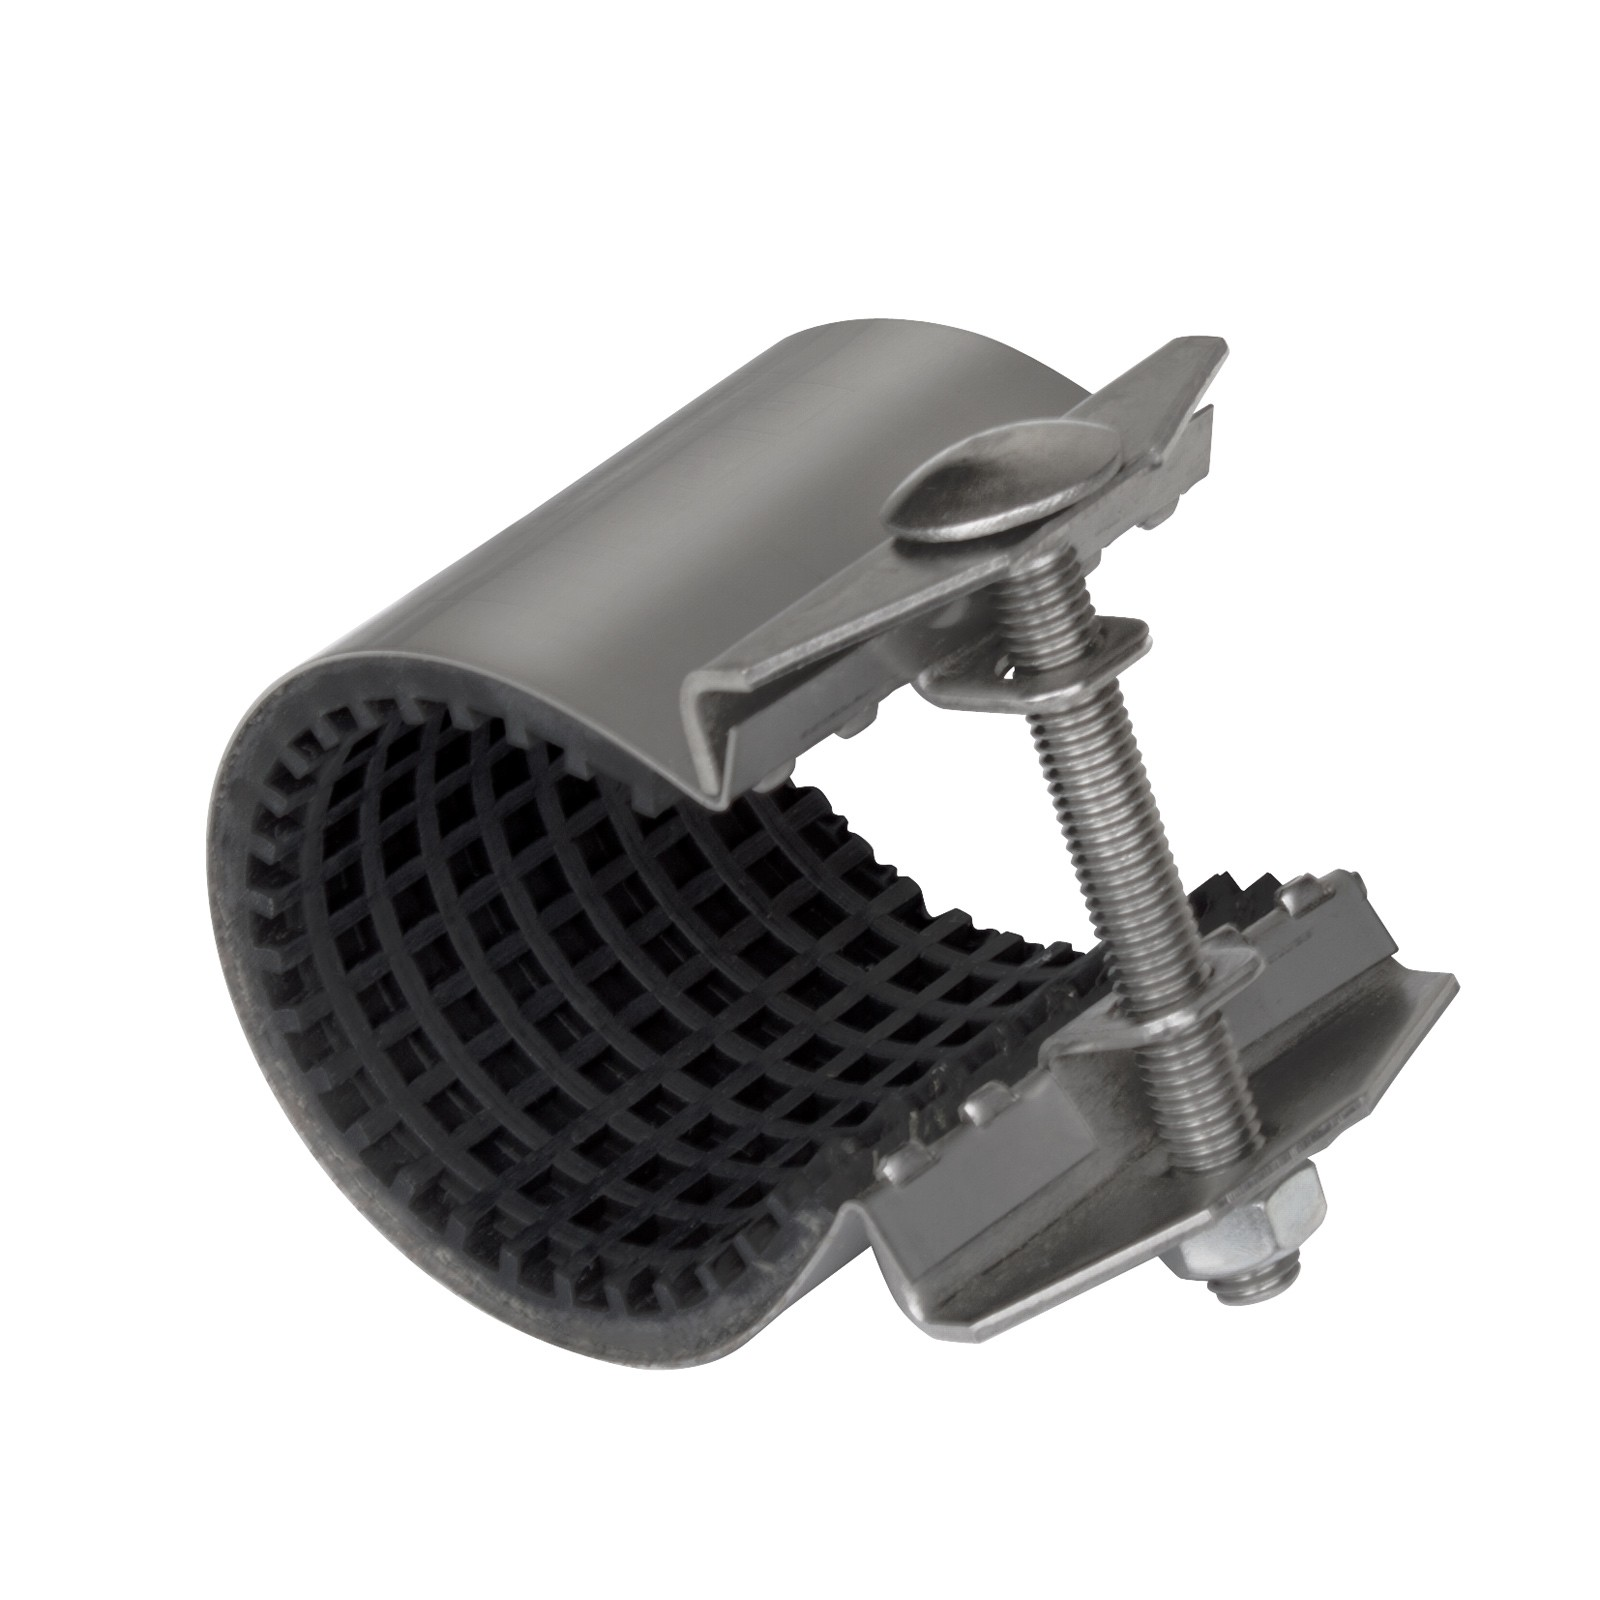 gebo unifix dn 48 49 50 51 mm edelstahl rohr reparatur dichtband dichtschelle ebay. Black Bedroom Furniture Sets. Home Design Ideas